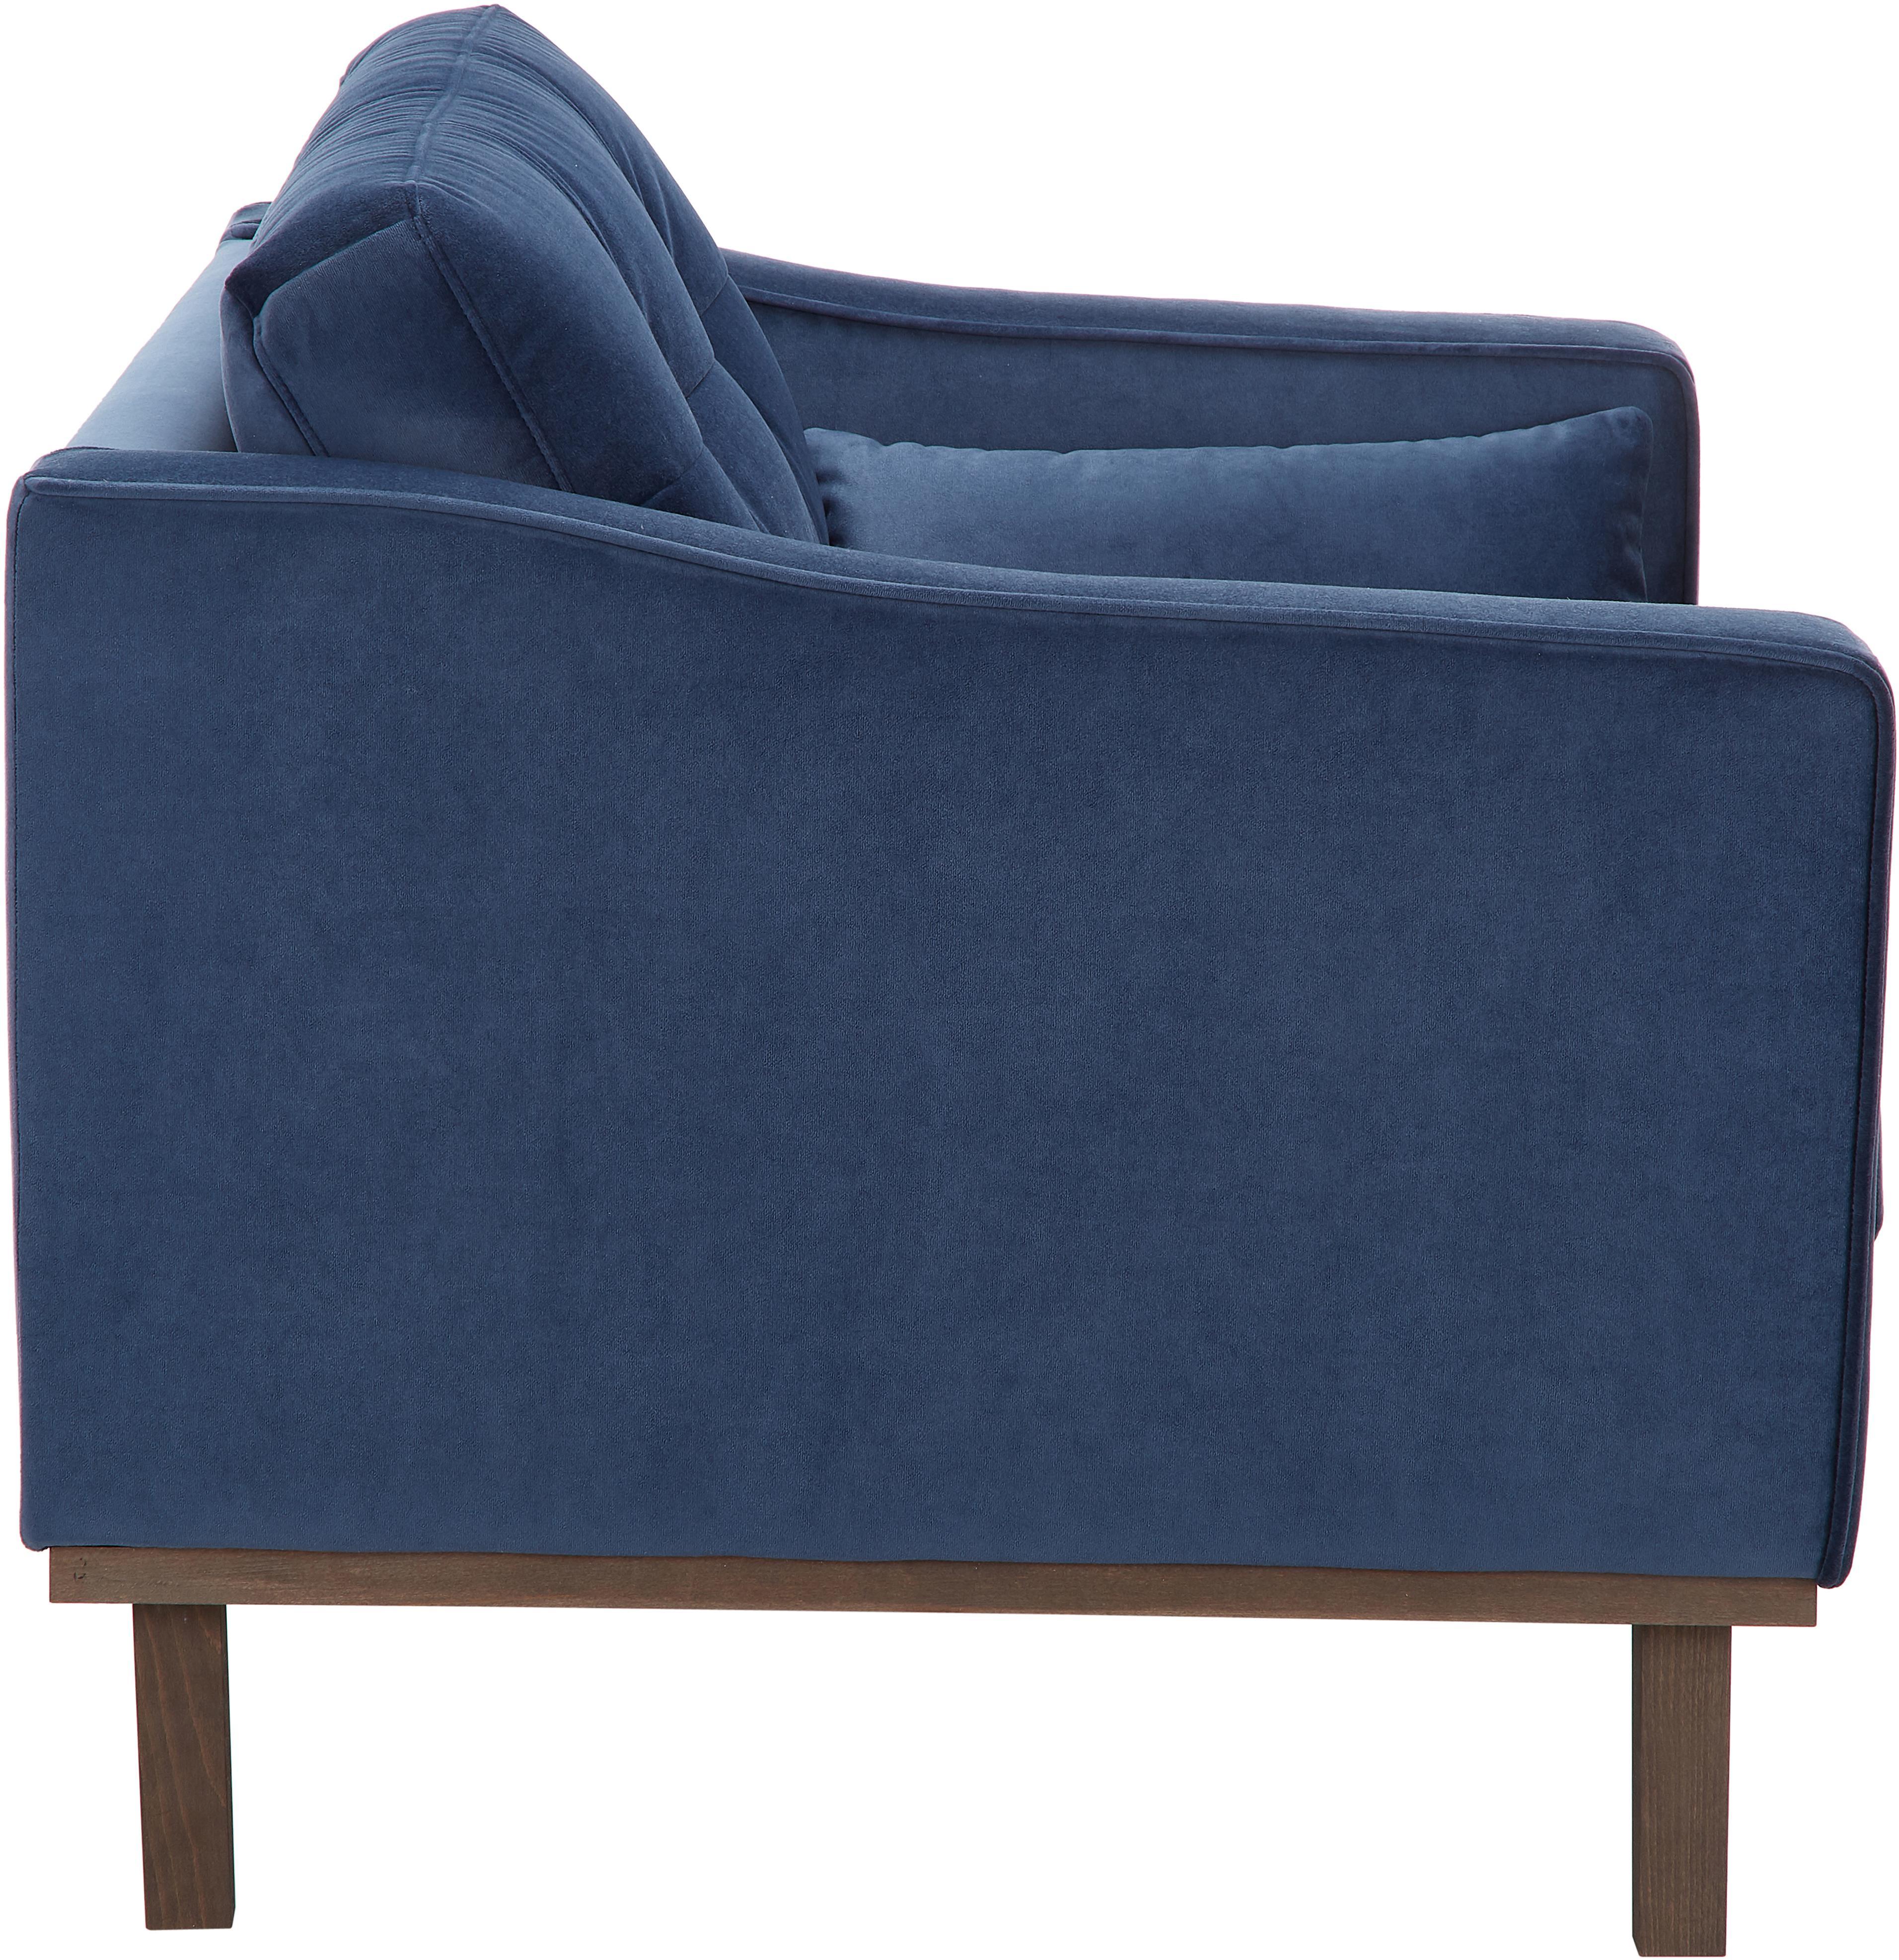 Klassischer Samt-Sessel Alva in Blau, Bezug: Samt (Hochwertiger Polyes, Gestell: Massives Kiefernholz, Füße: Massives Buchenholz, gebe, Samt Dunkelblau, B 102 x T 92 cm